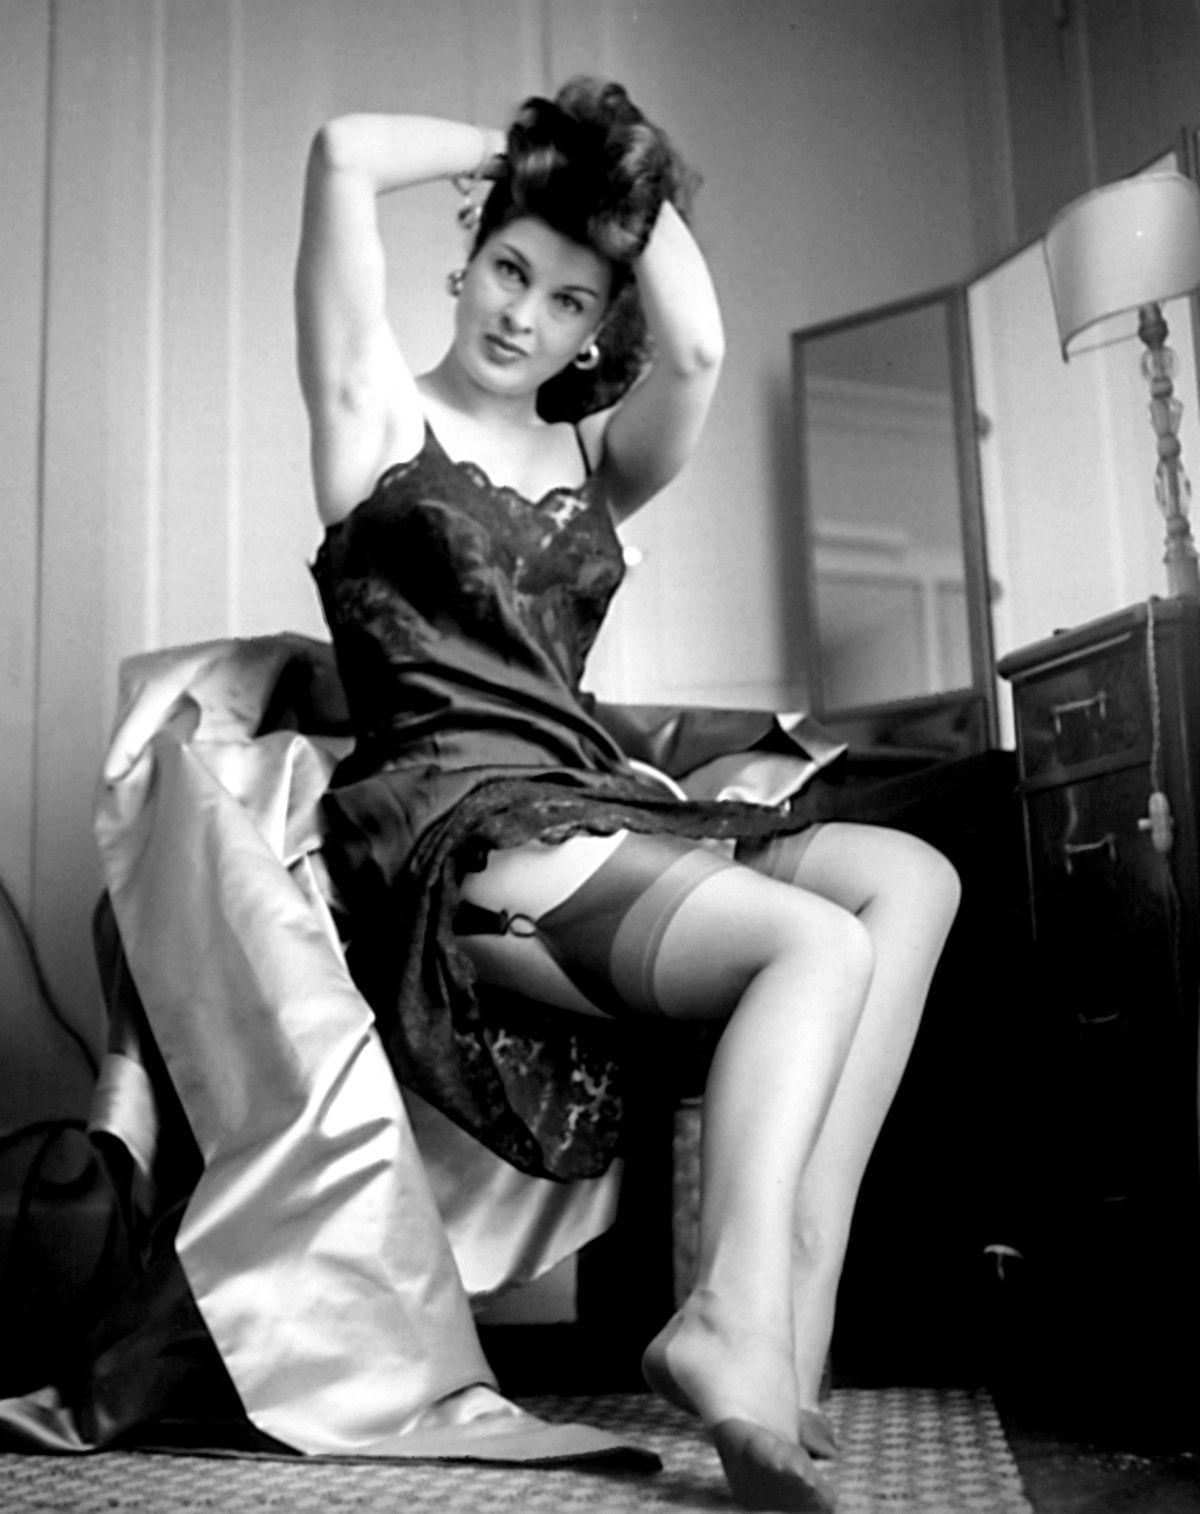 foto Silvana Pampanini (born 1925)